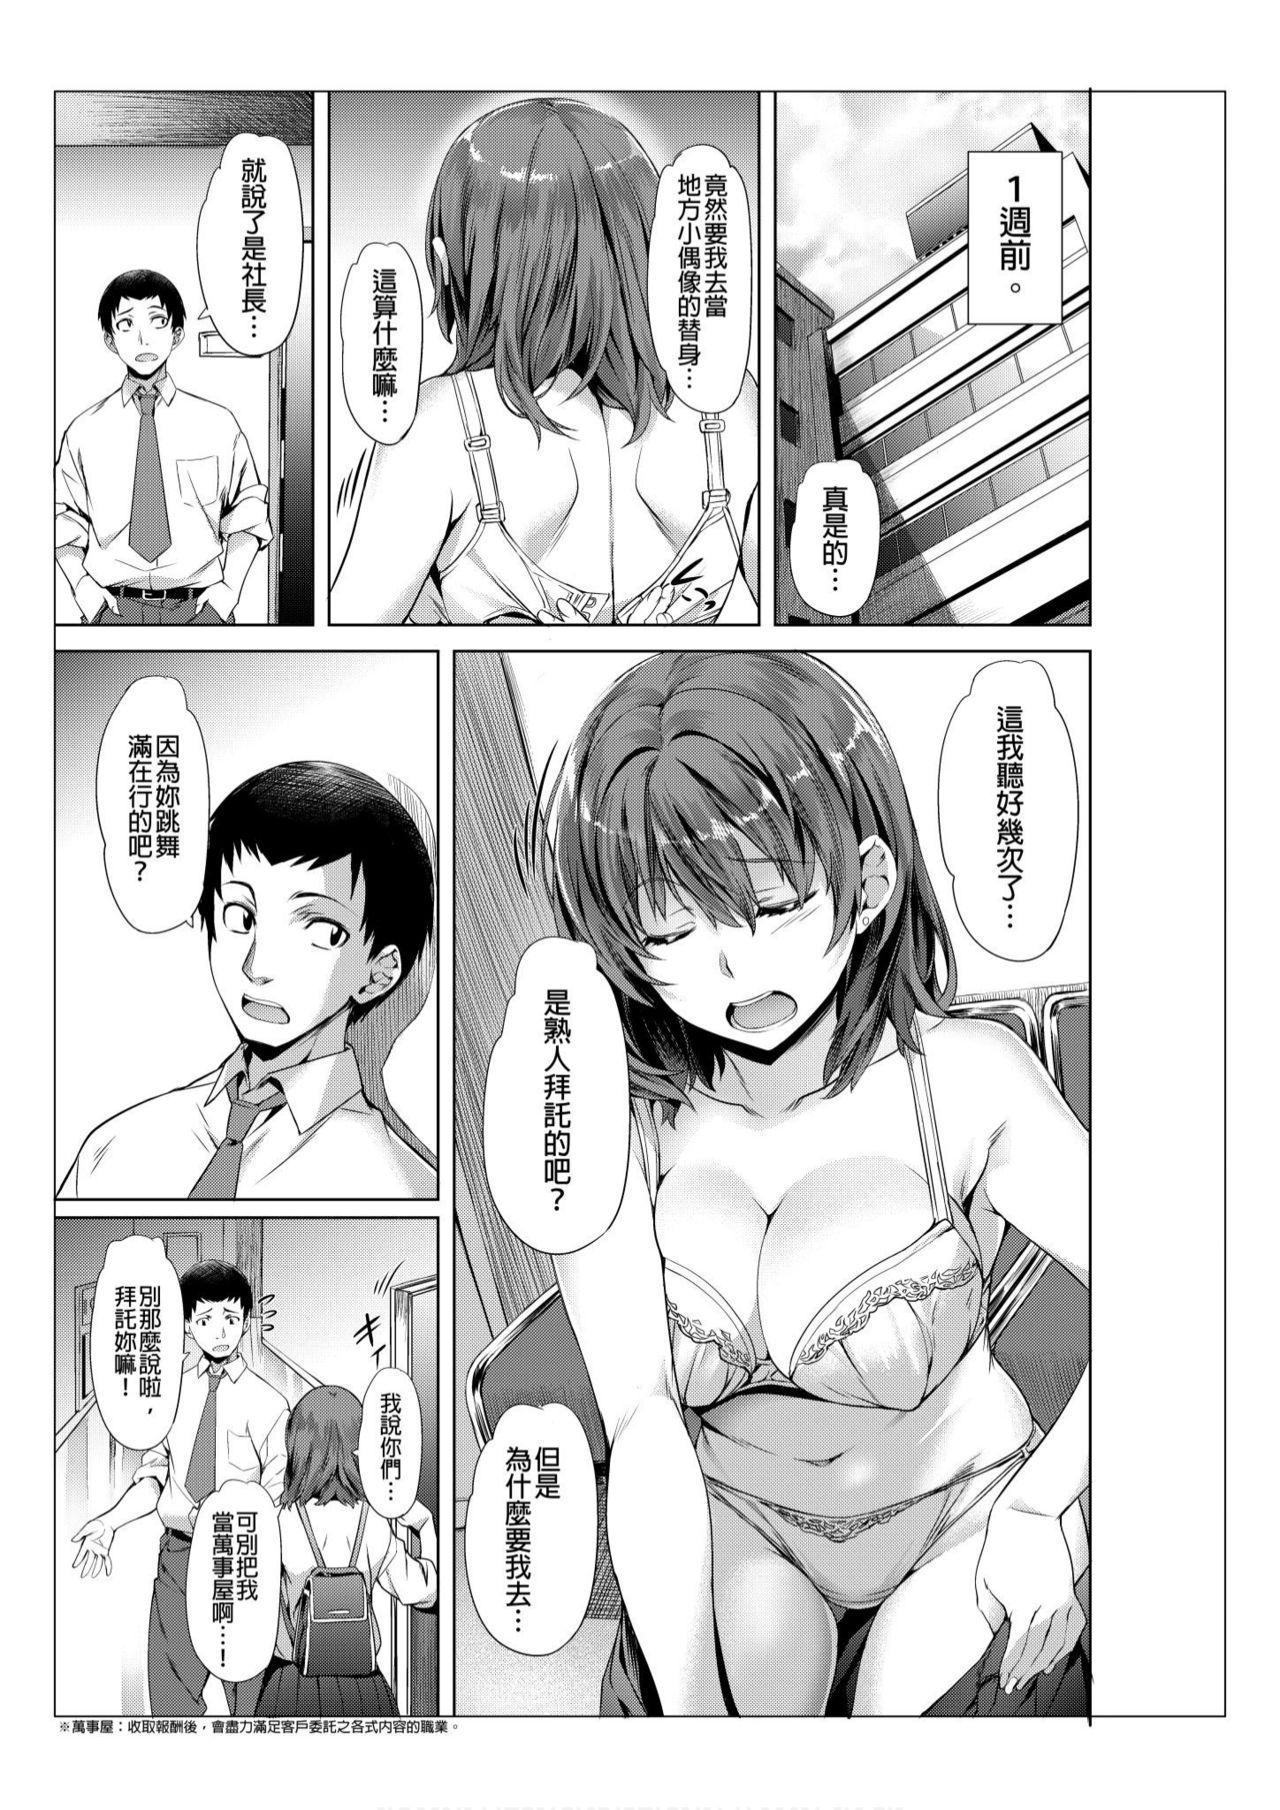 [Nagayori] Towel Ichimai de Otoko Buro.~ Shiranai Ojisan-tachi to Honiki Sex ~ | 只裹了條小毛巾就進男浴池的我。~被完全不認識的大叔們弄到高潮了~ [Chinese] [Decensored] 28